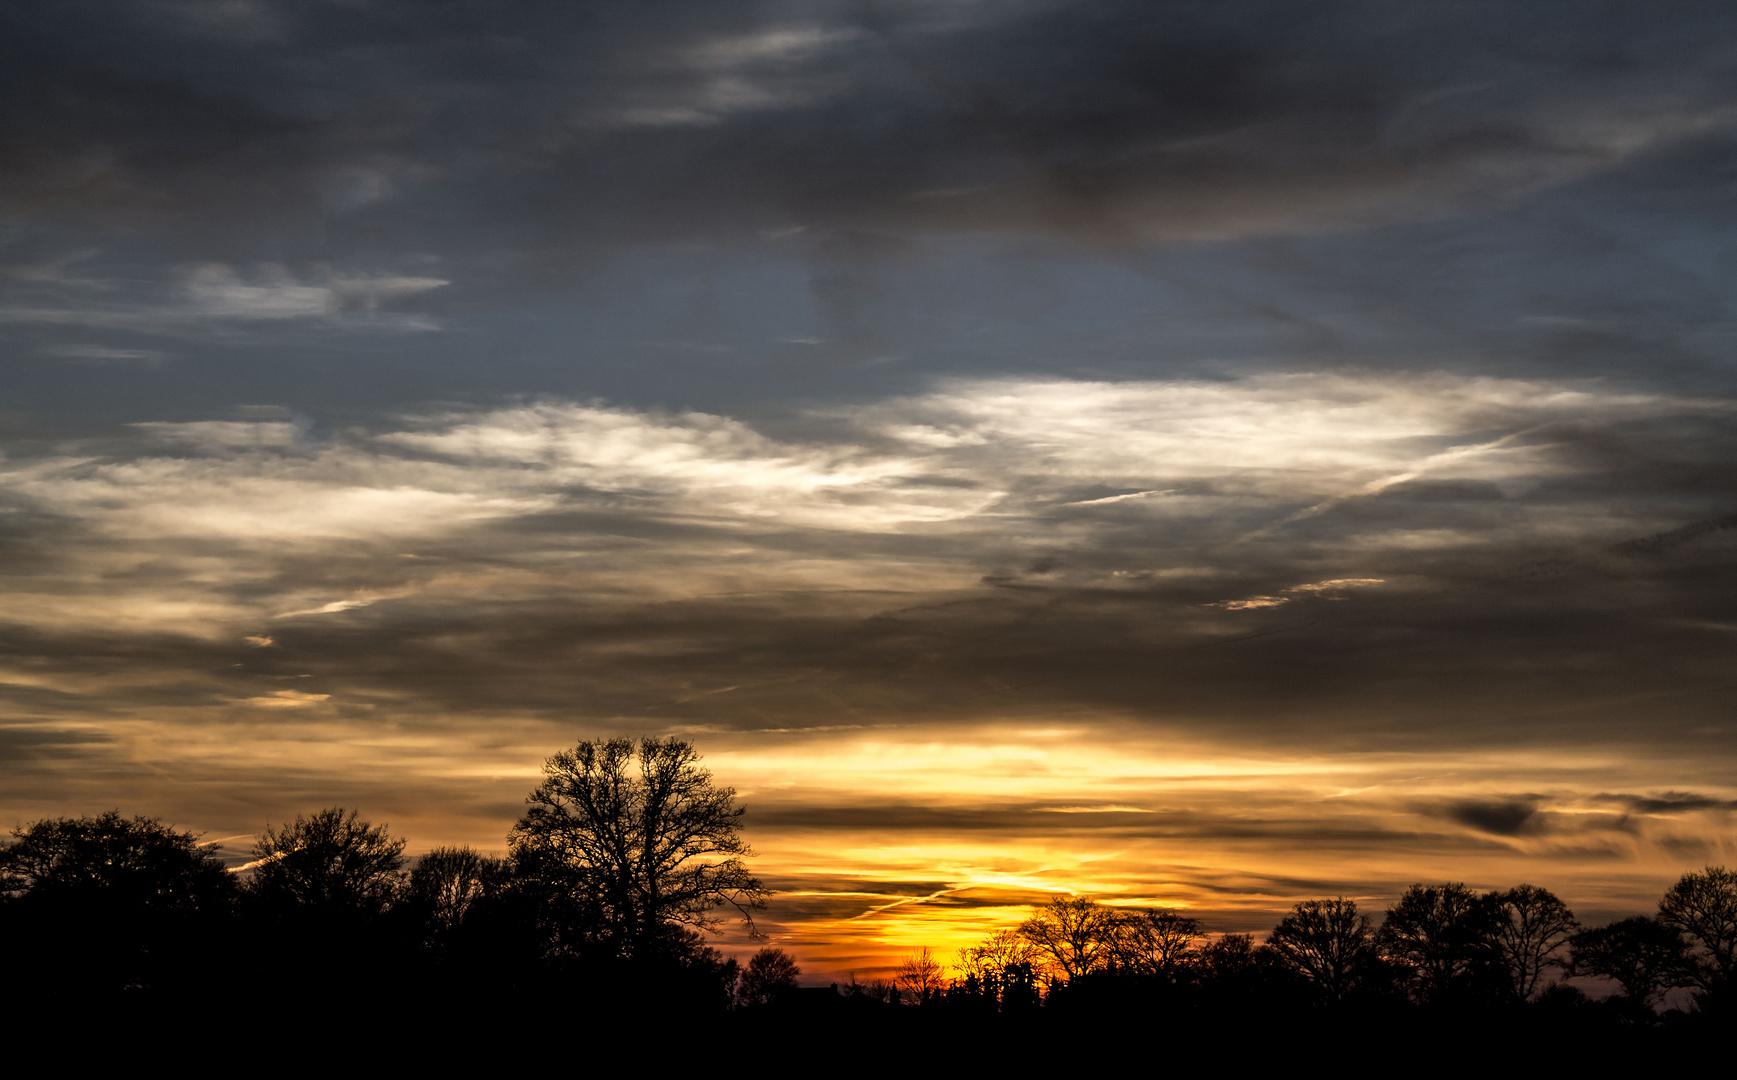 Kontraststarker Sonnenuntergang